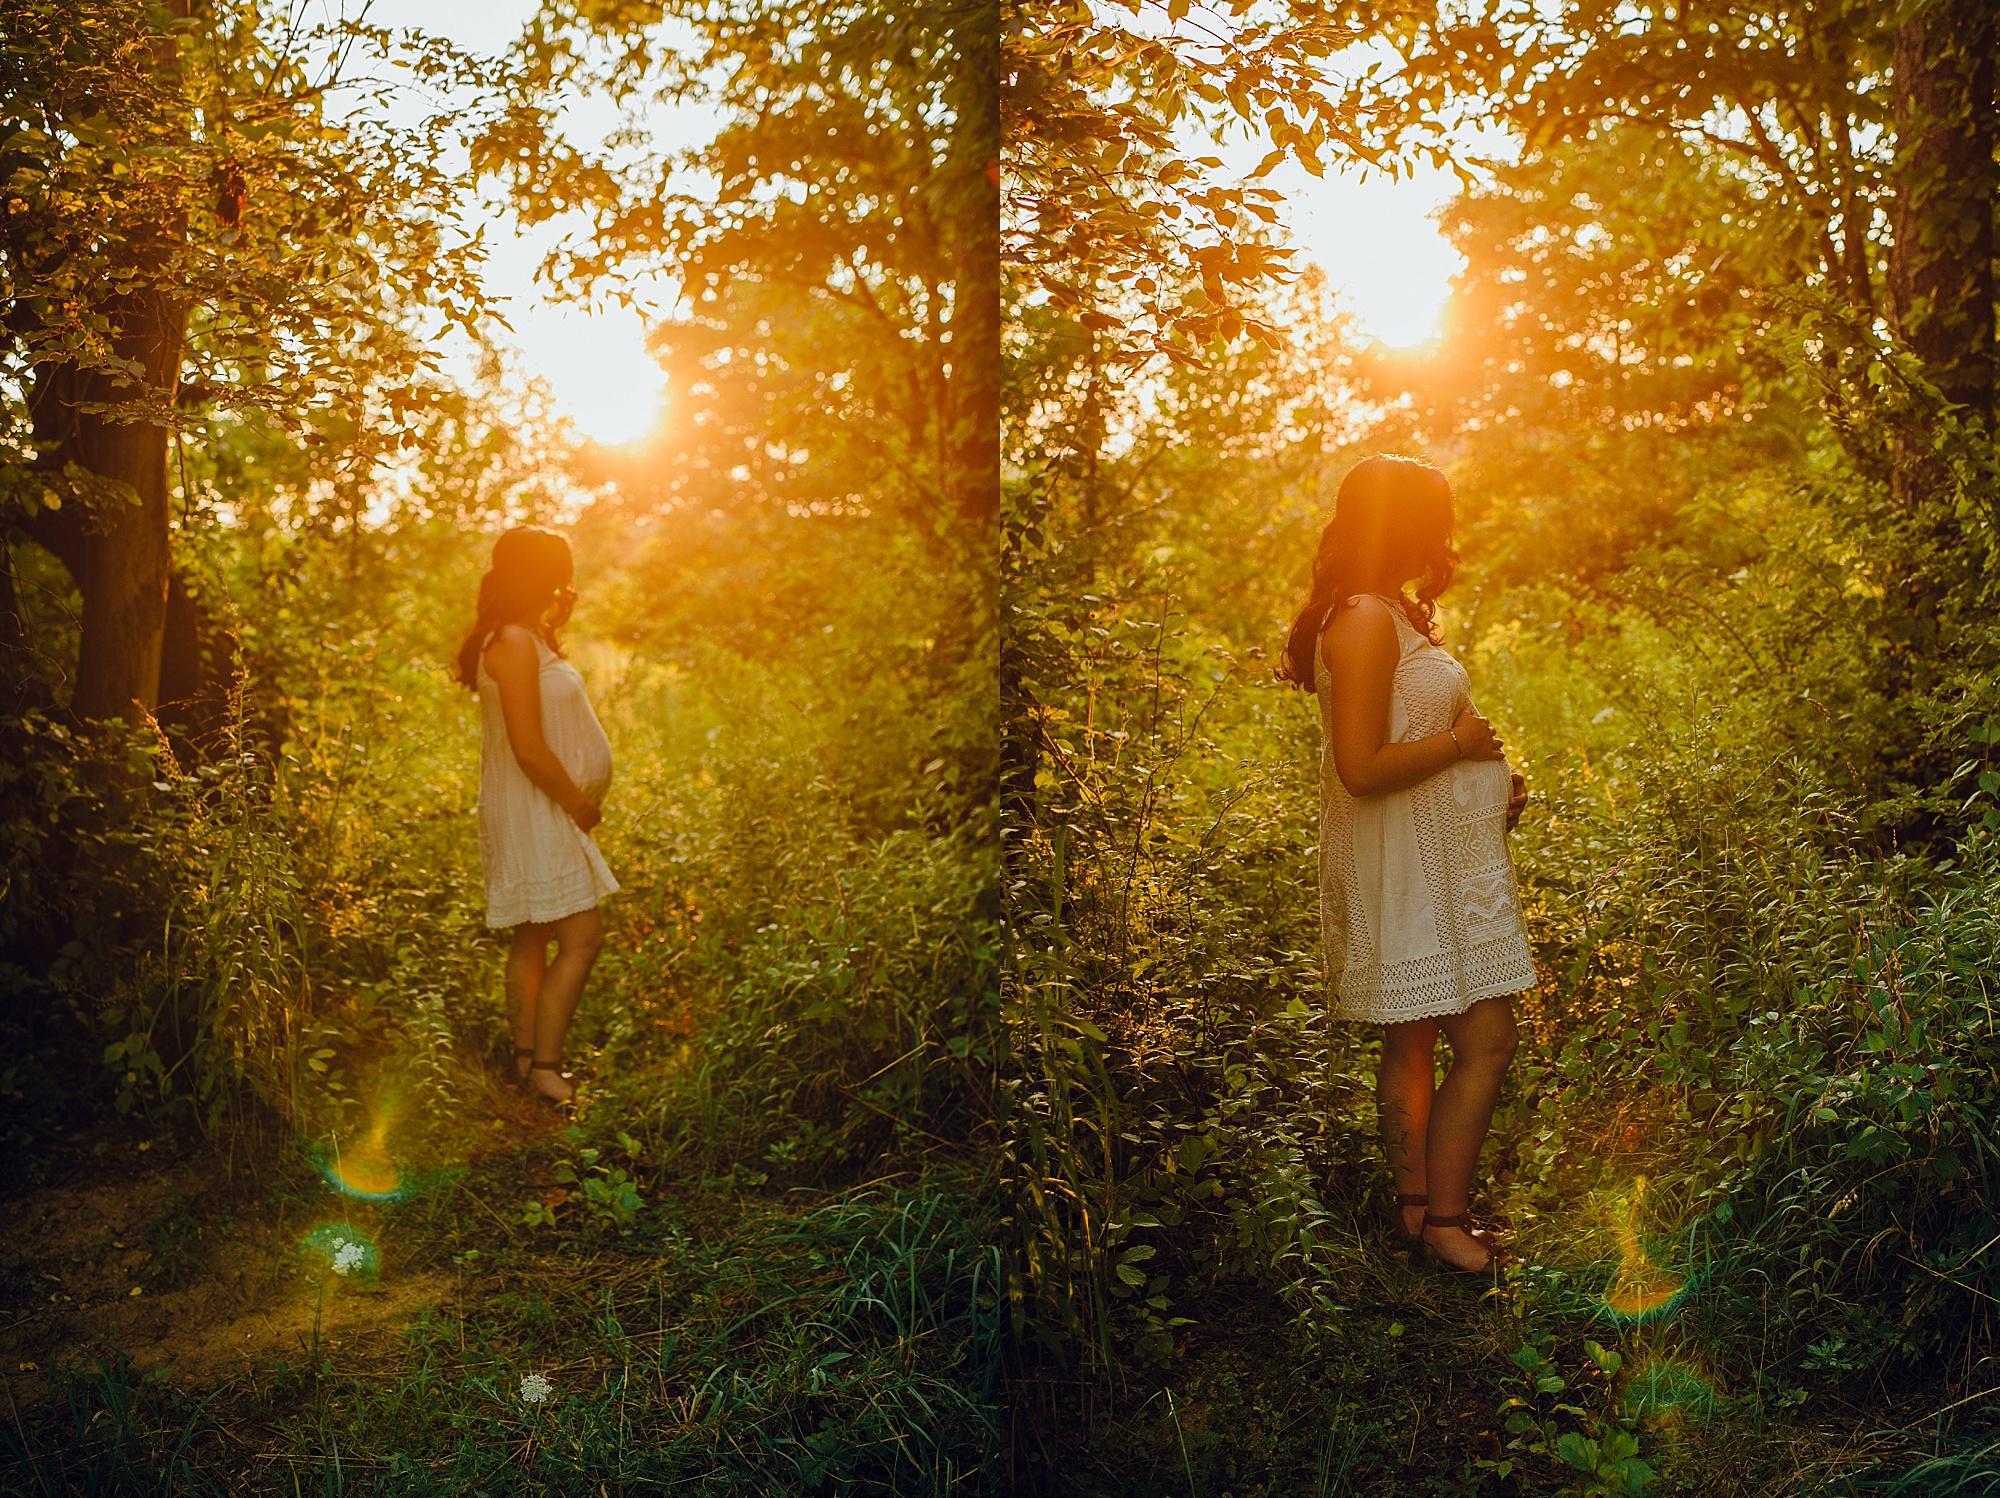 lauren-grayson-photography-cleveland-ohio-photographer-maternity-summer-outdoor-bohemian-fields-session_0504.jpg